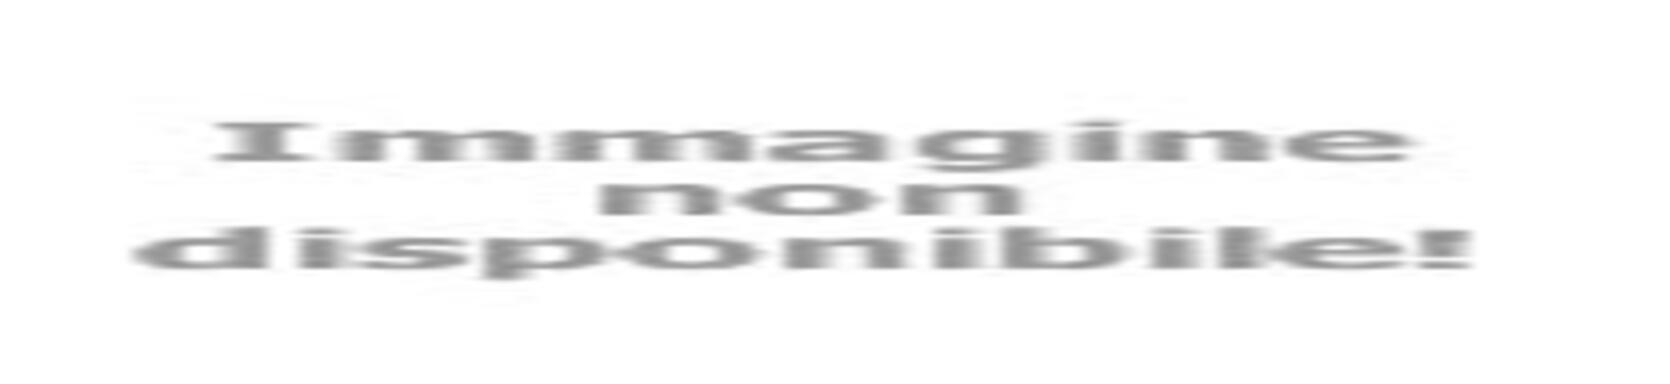 basketriminicrabs it 6-2711-video-eybl-u20-playoff-london-vs-crabs 005